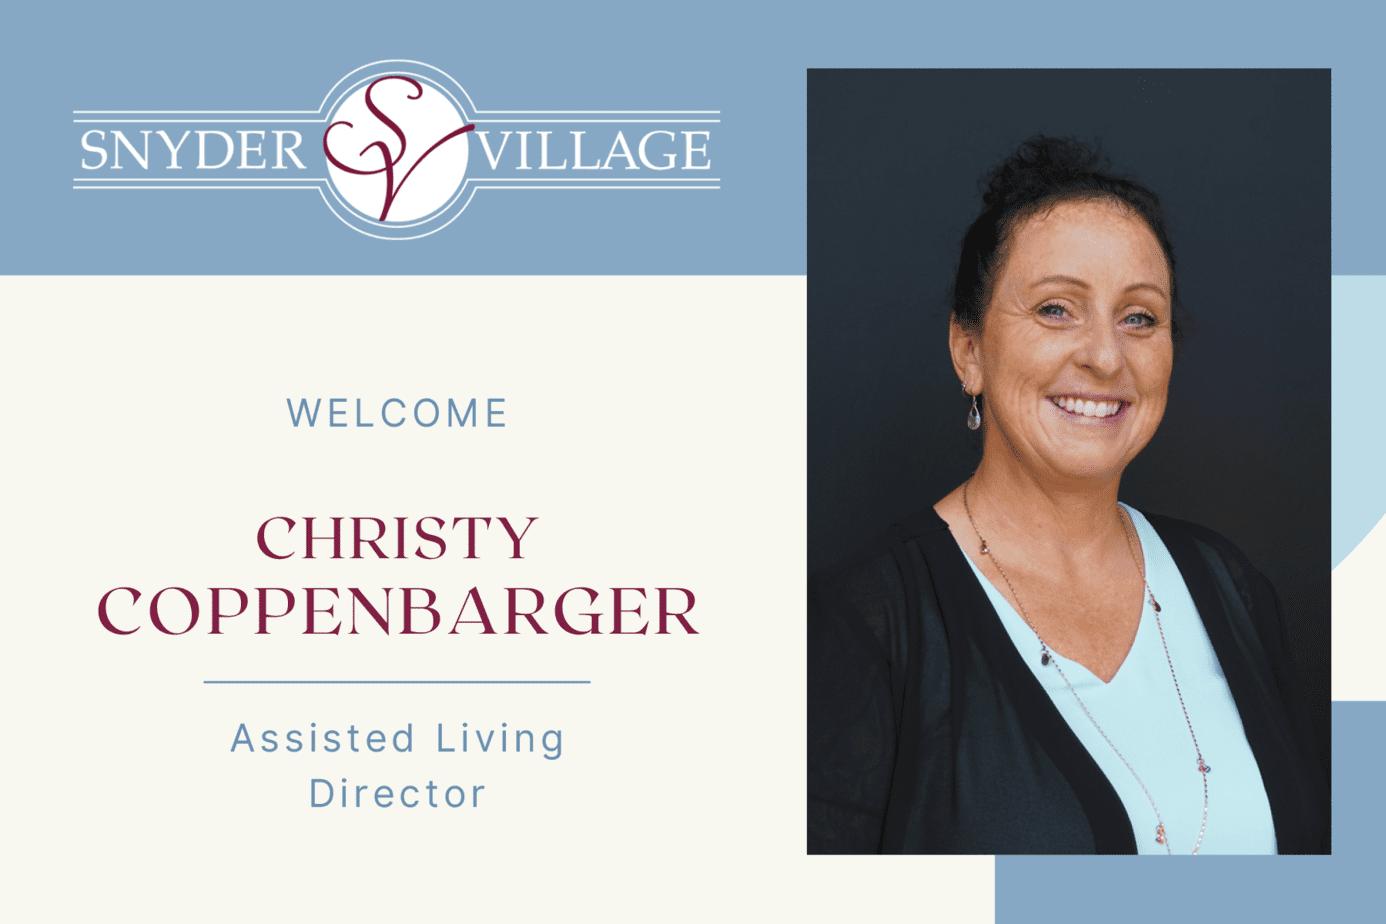 Snyder Village Names New Assisted Living Director